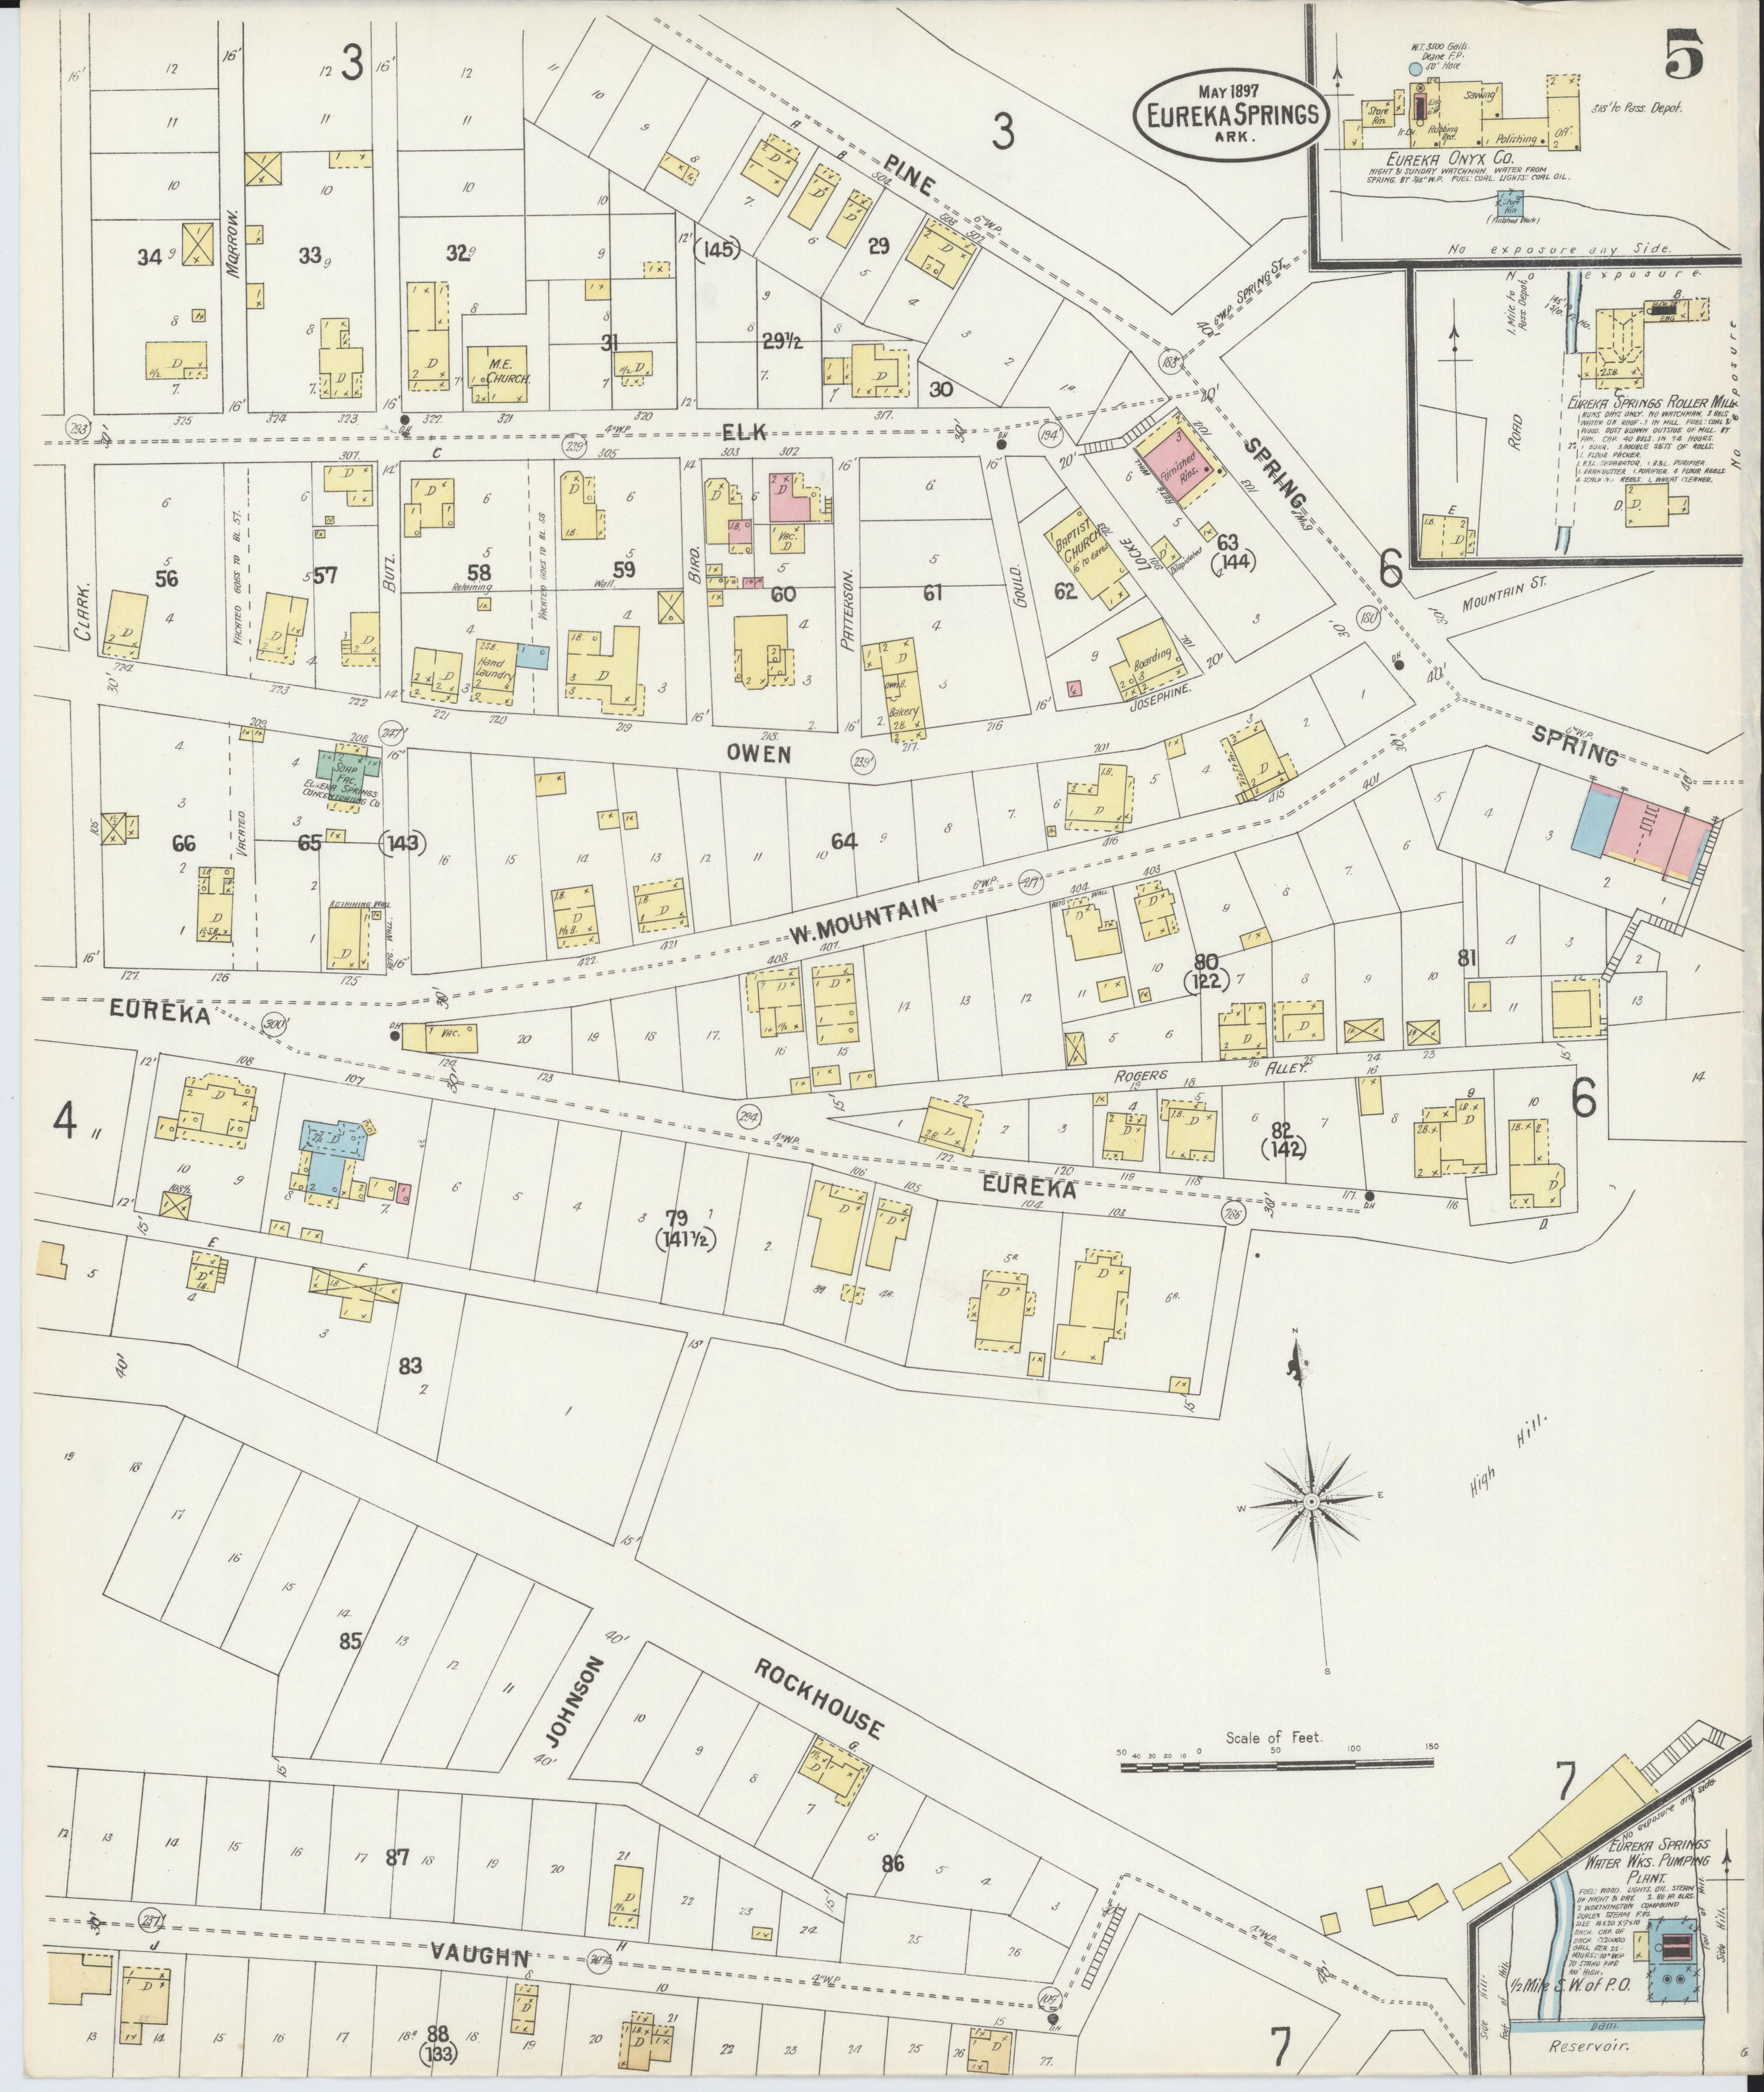 File:Sanborn Fire Insurance Map from Eureka Springs, Carroll ... on map of dermott arkansas, map of downtown banner elk nc, map of buffalo national river arkansas, map of yellville arkansas, map of decatur arkansas, map of de witt arkansas, map of london arkansas, map of arkansas in us, map of the buffalo river arkansas, map of mountainburg arkansas, map of everton arkansas, map of bauxite arkansas, map of washington arkansas, map of perryville arkansas, map of foreman arkansas, map of california eureka ca, map of drasco arkansas, map of gurdon arkansas, map of hoxie arkansas, map of springfield arkansas,